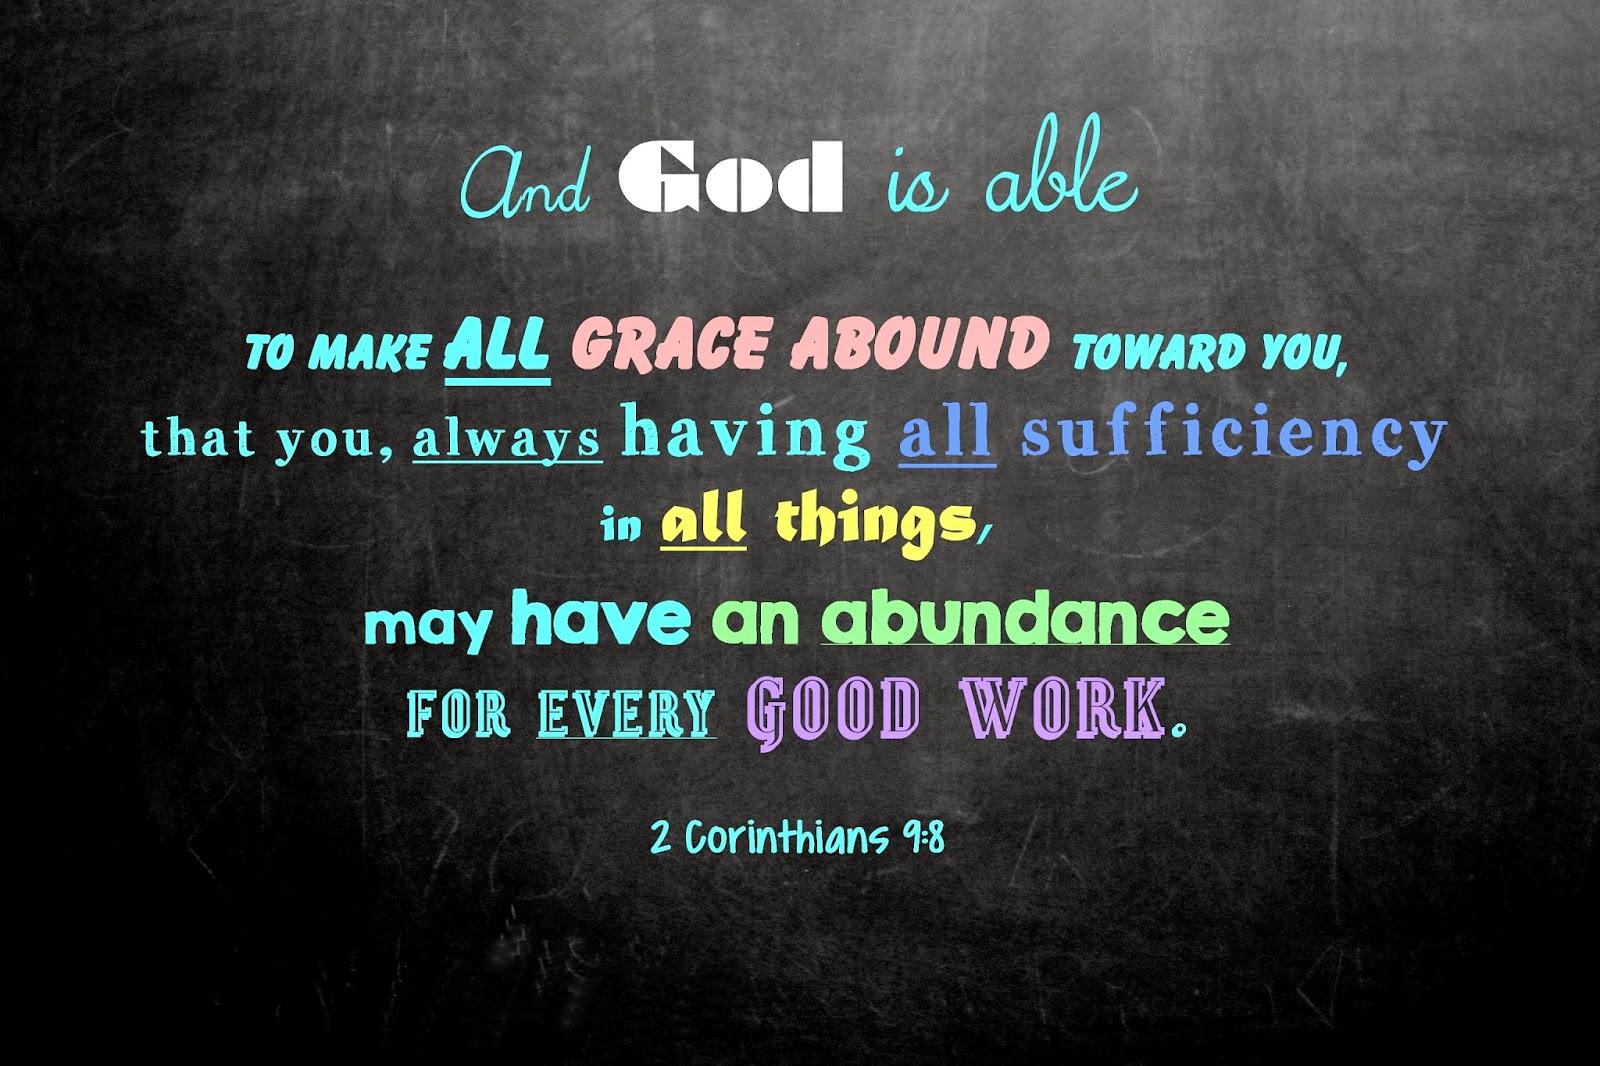 Susan's Blog: God Is Able